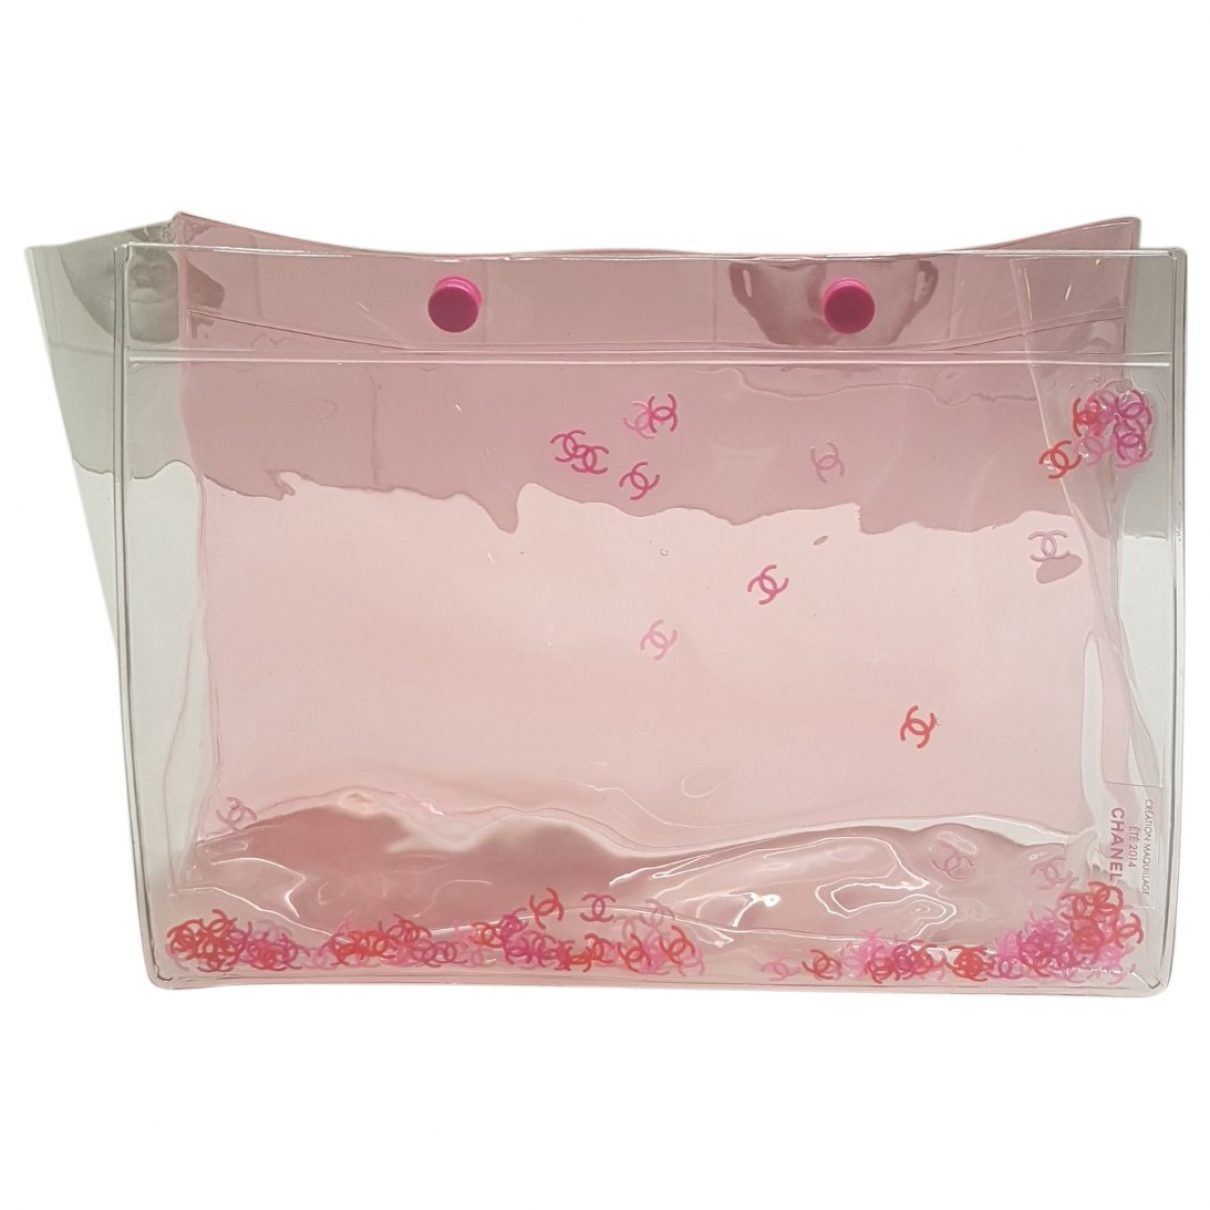 Chanel \N Pink Travel bag for Women \N